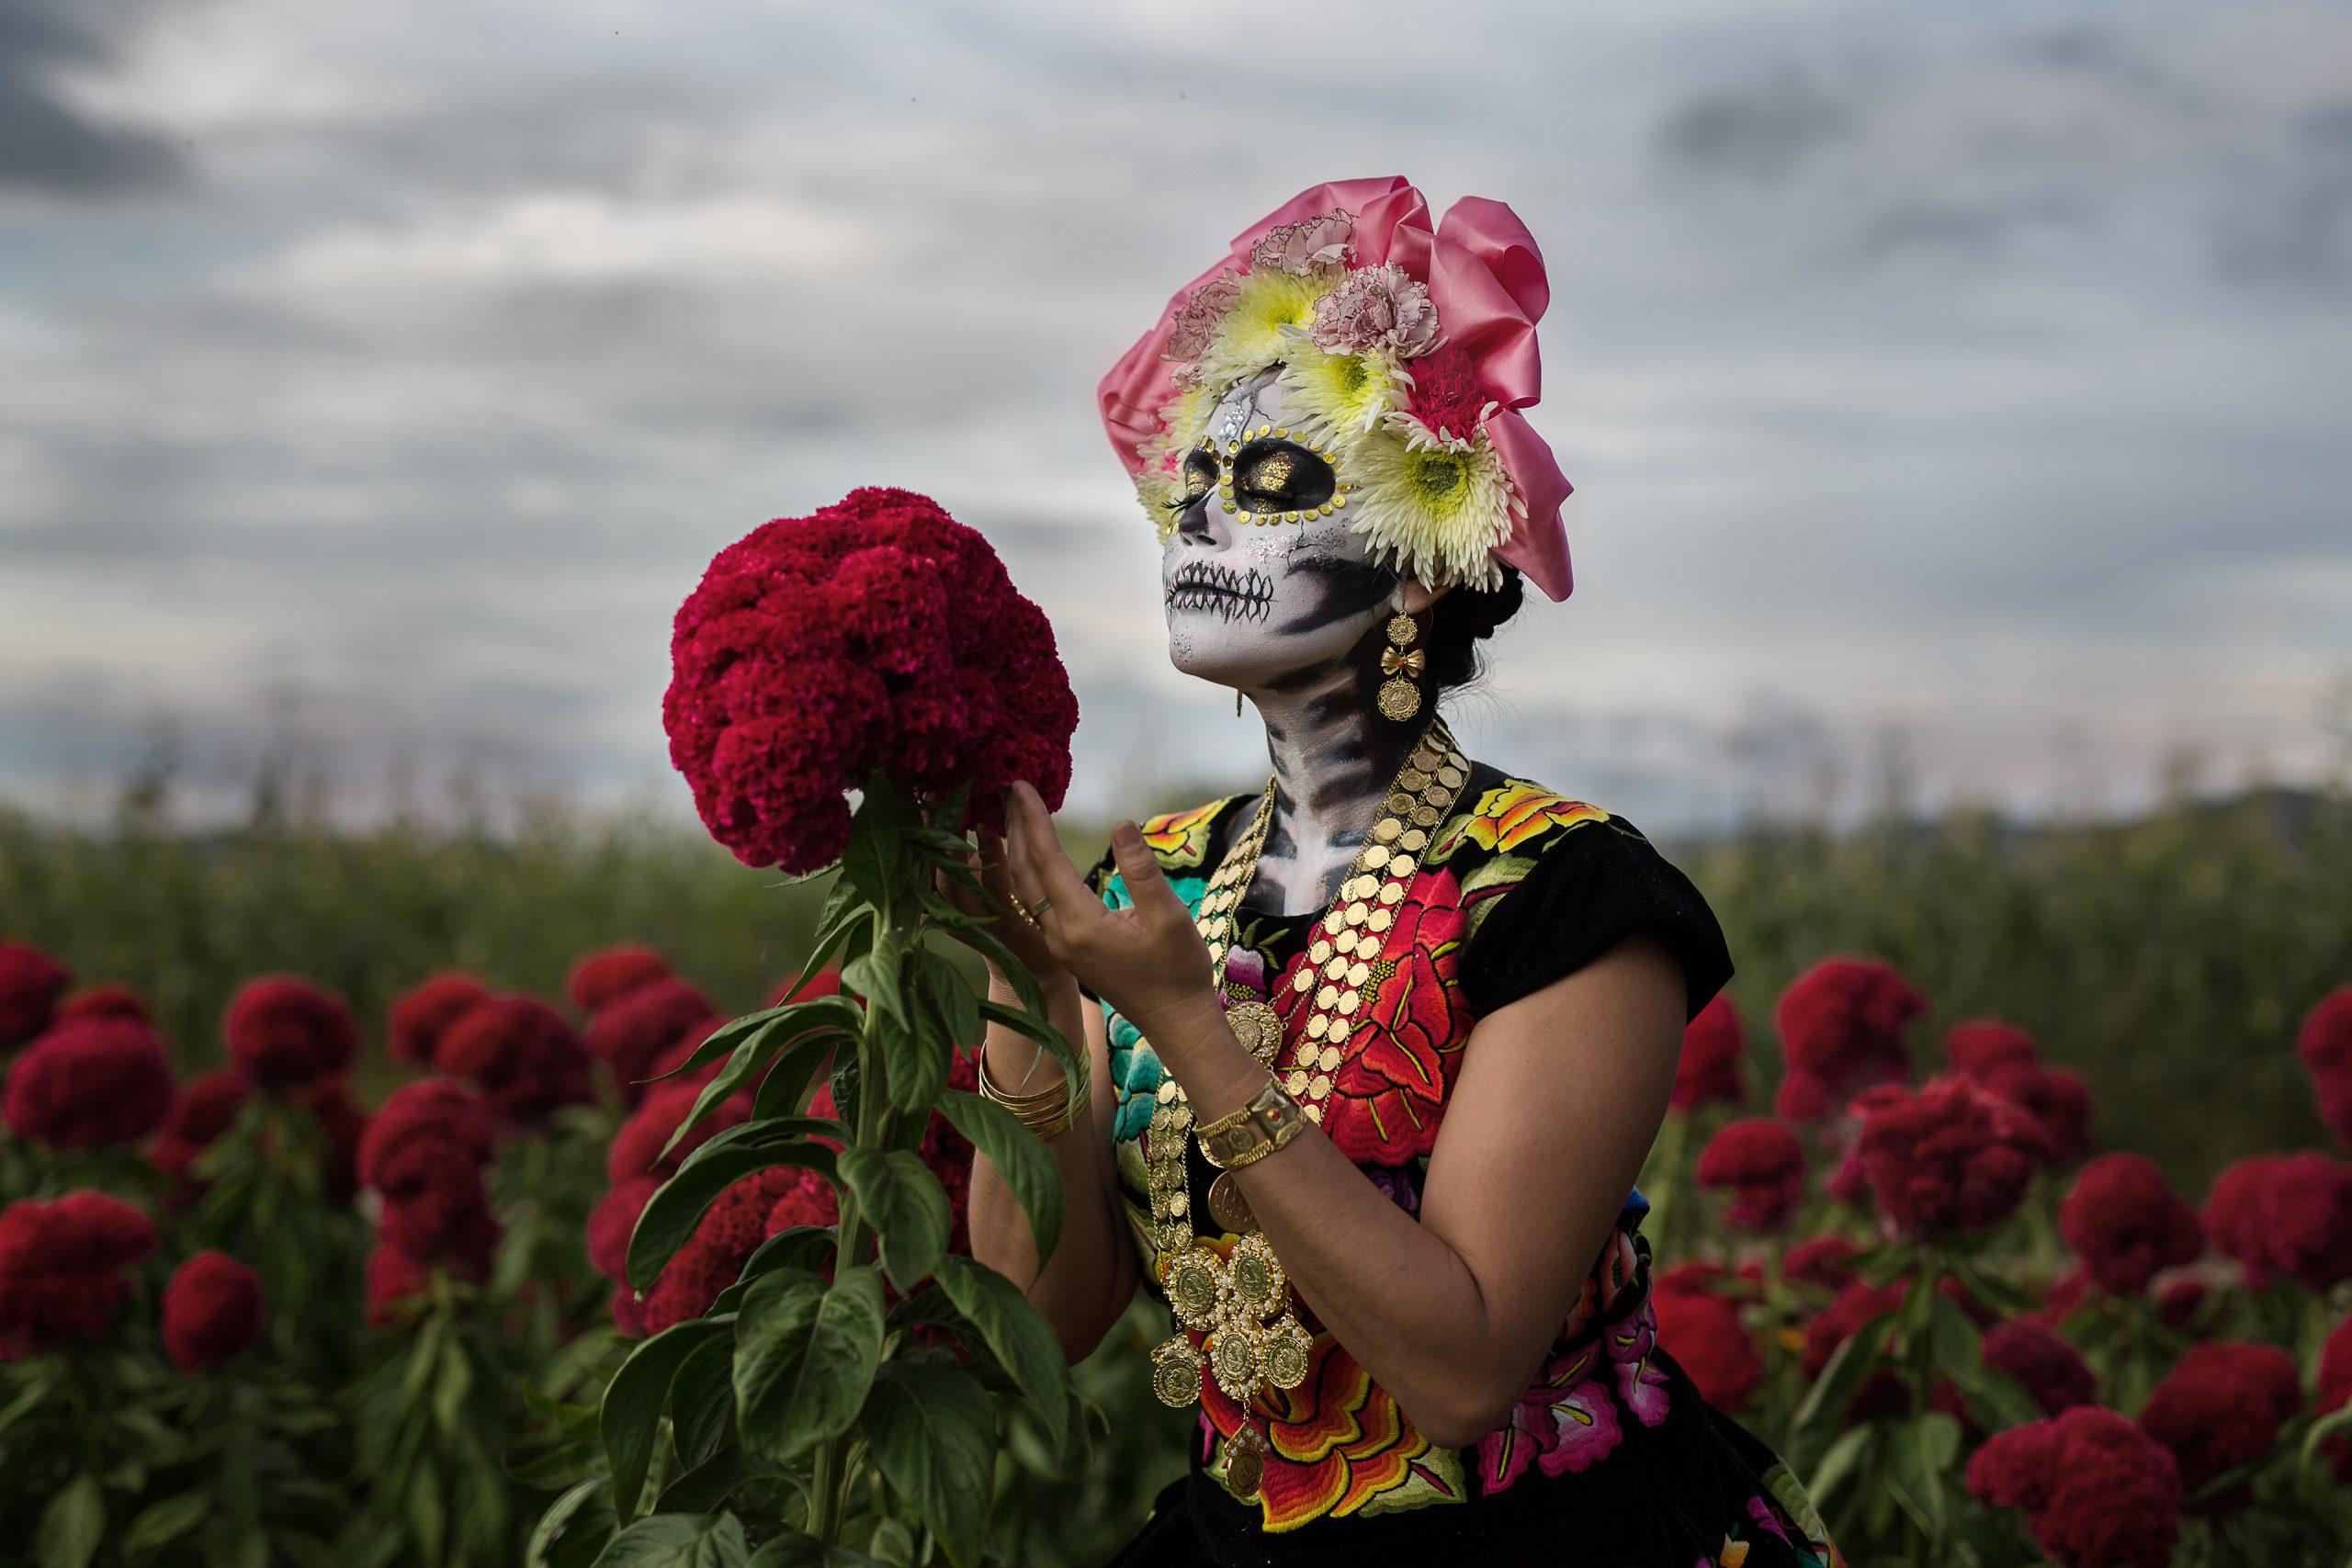 Catrina im Blumenfeld 1 - Mexiko